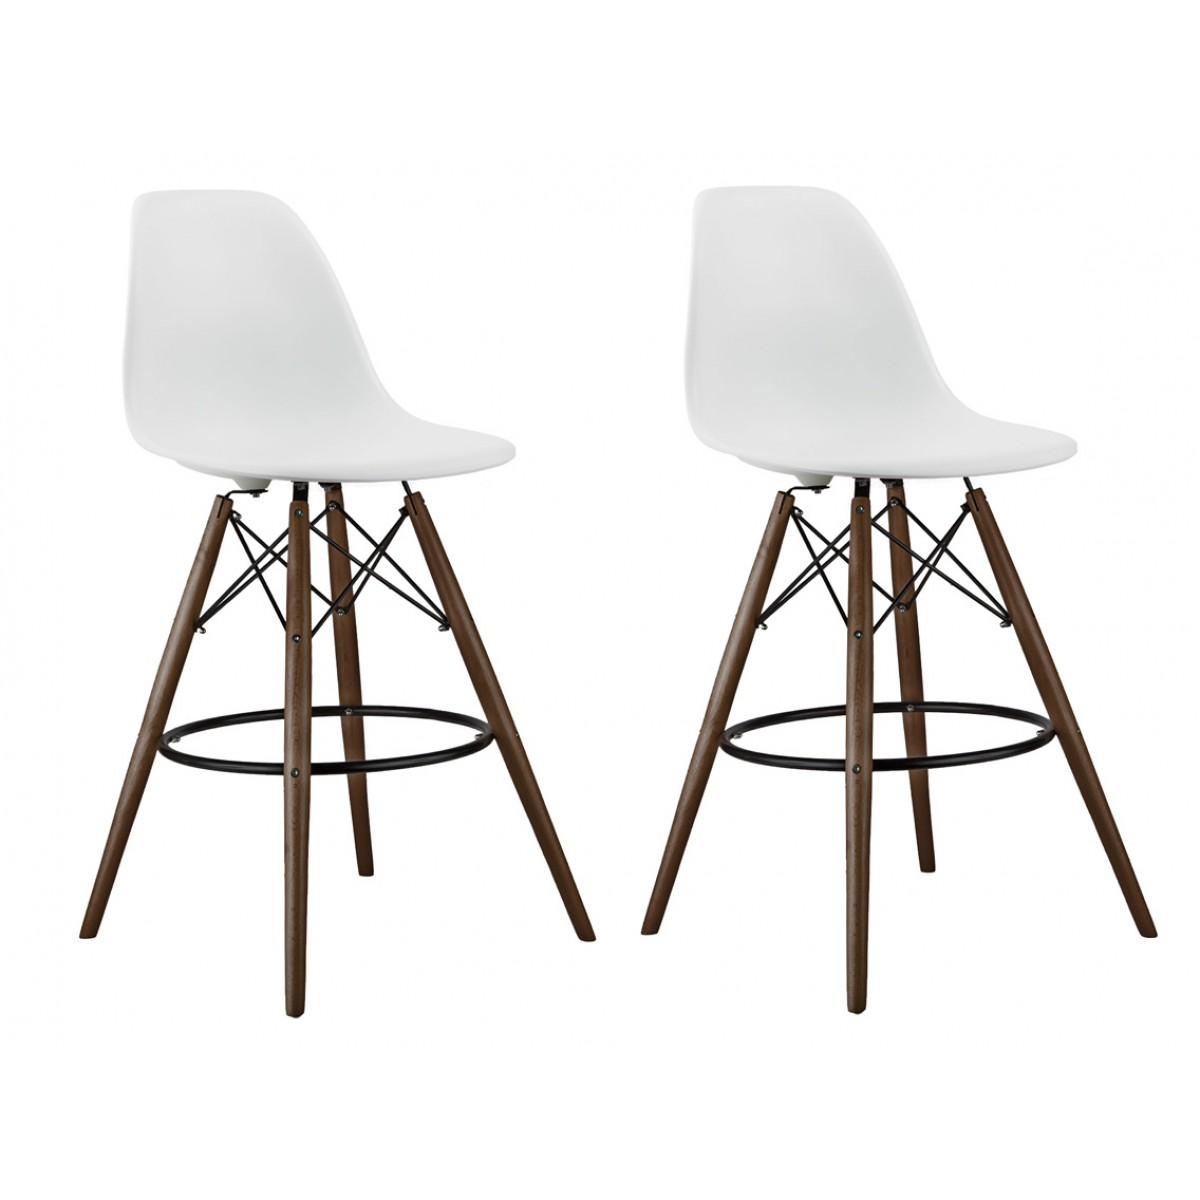 Set Of 2 26 Inch White Dsw Counter Stool With Dark Walnut Wood Eiffel Legs